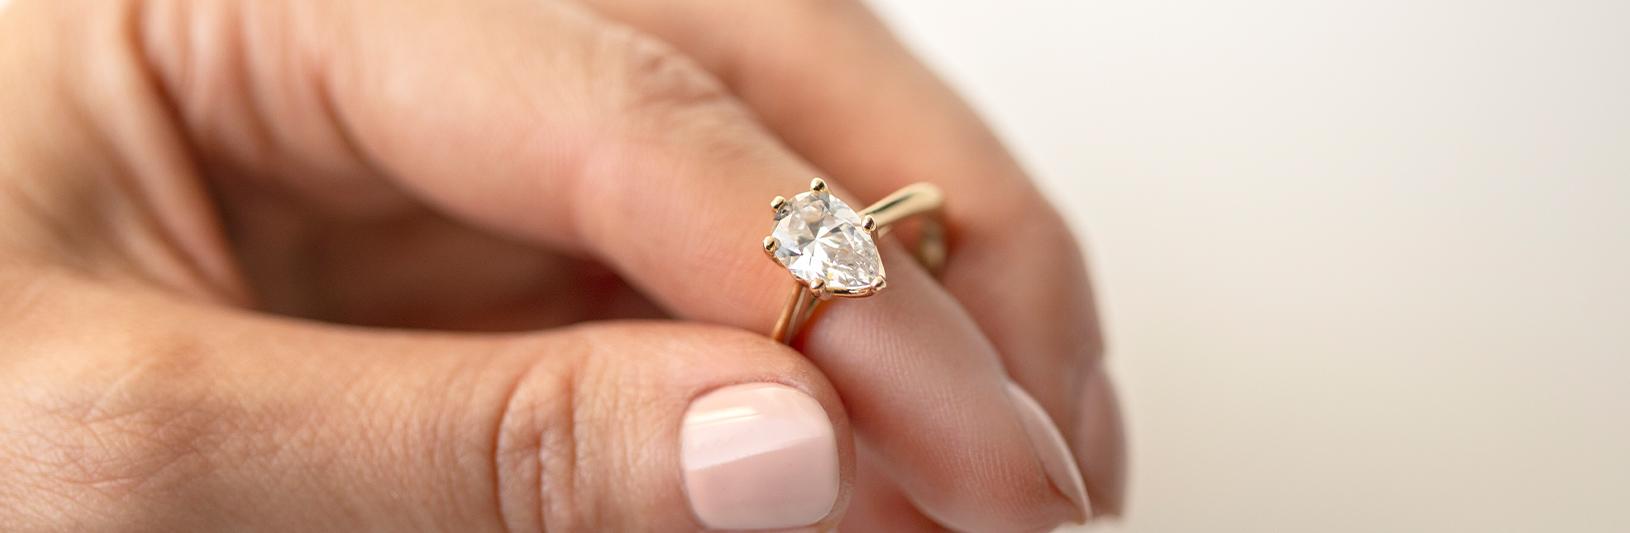 A pear cut lab grown diamond in a claw setting